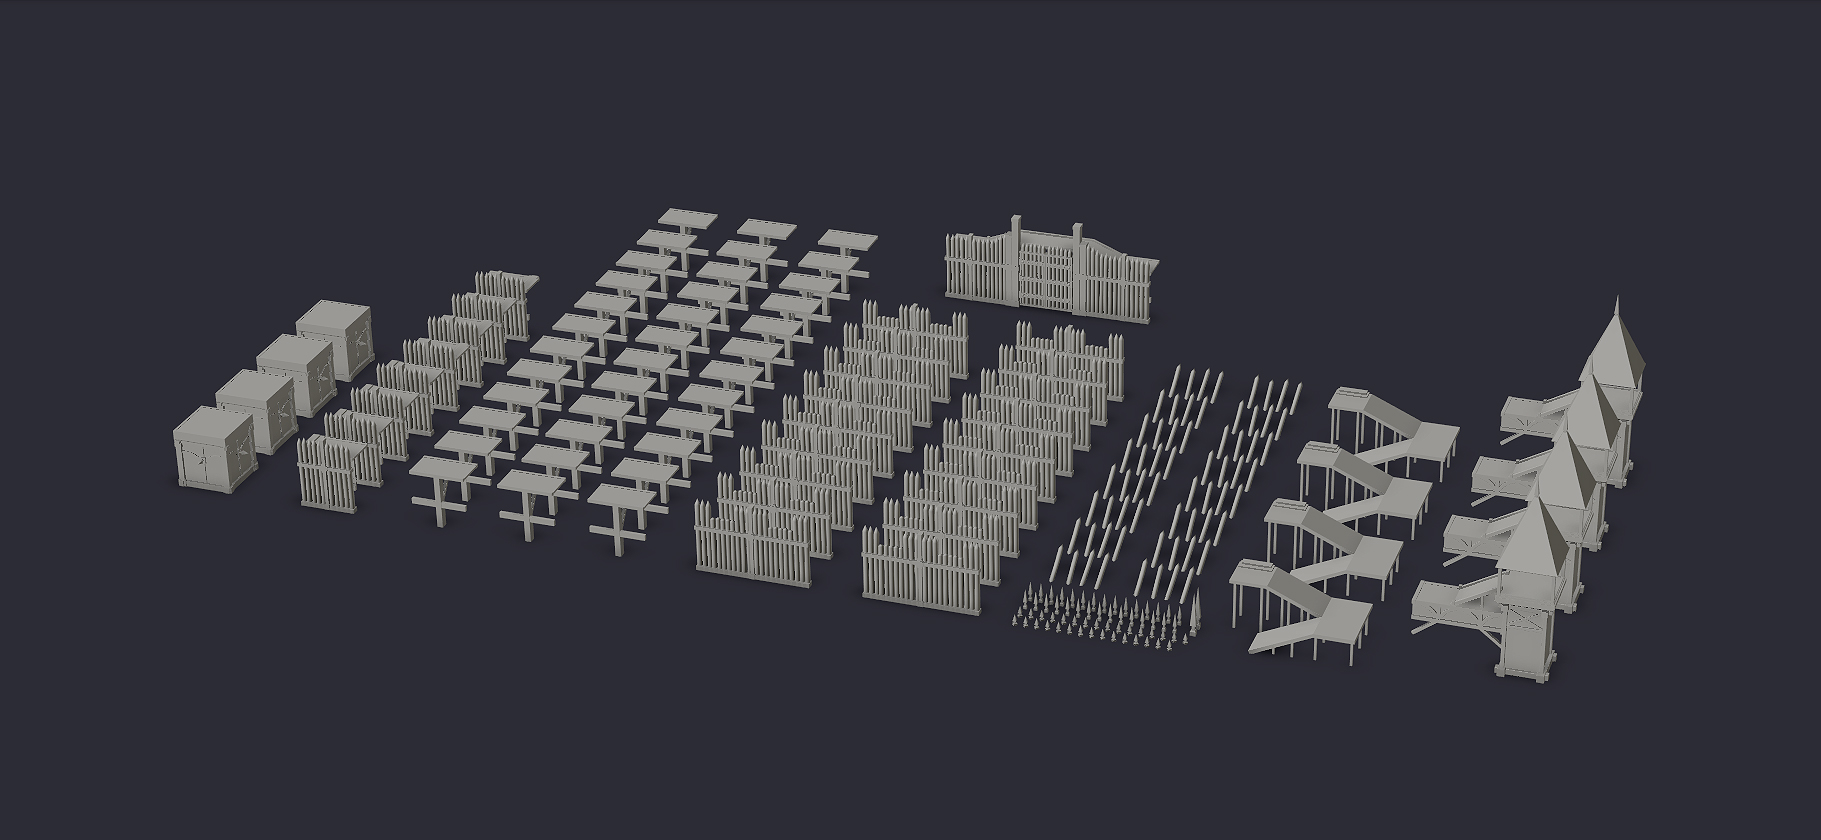 Fort_Large_Segments.jpg